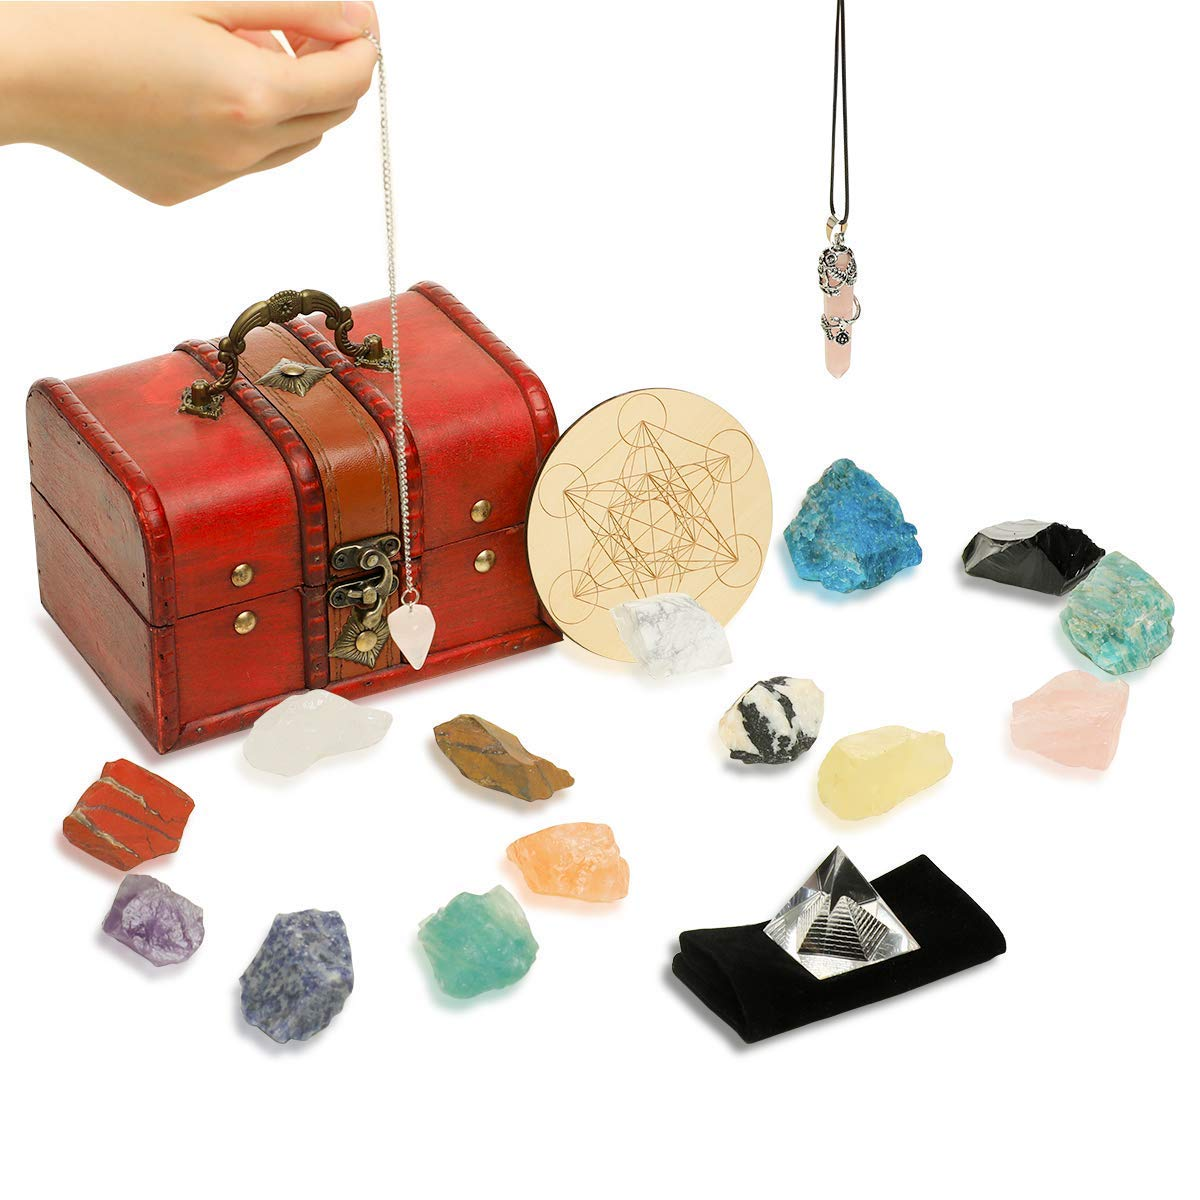 Soulnioi 18Pcs Healing Crystals kit (14 Chakra Stones, Quartz Pendulum, Crystal Necklace, Crystal Grid Kit, Energy Pyramid) + Wooden Box, for Meditation, Spiritual Gifts for Women, Girlfriend, Lady